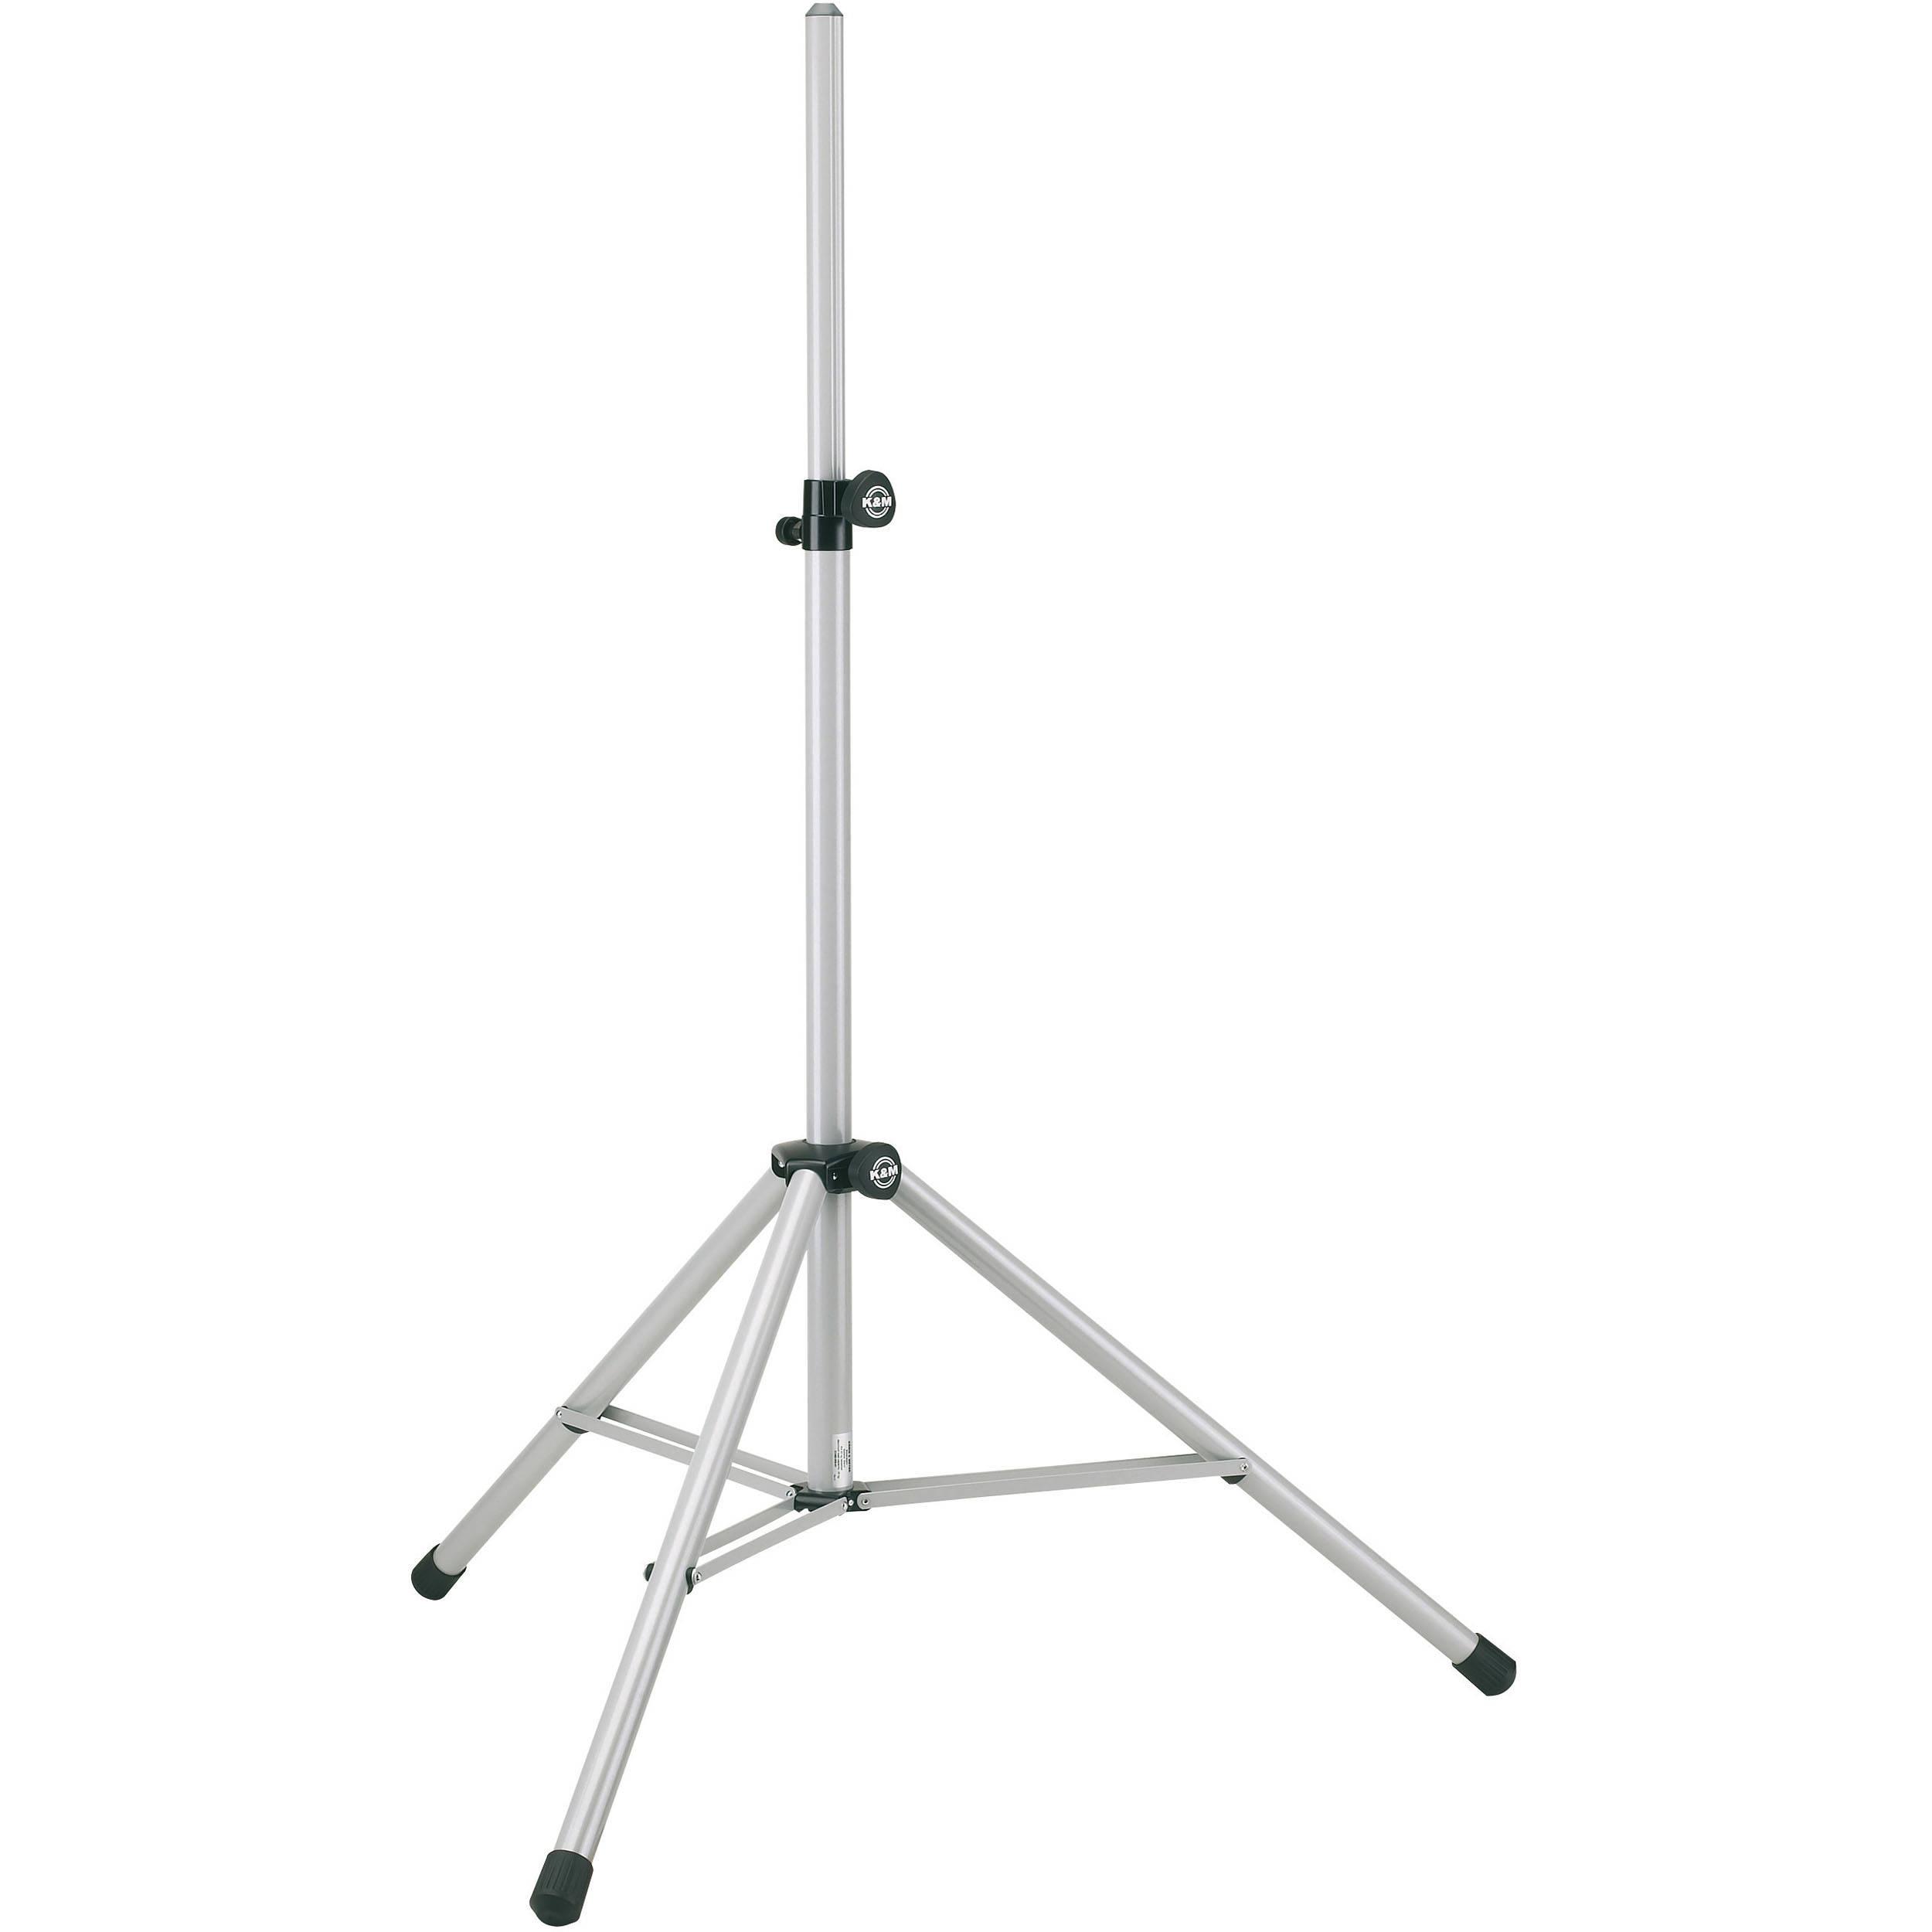 K&M 214/6 Adjustable Speaker Stand (White) 21460-177-57 B&H